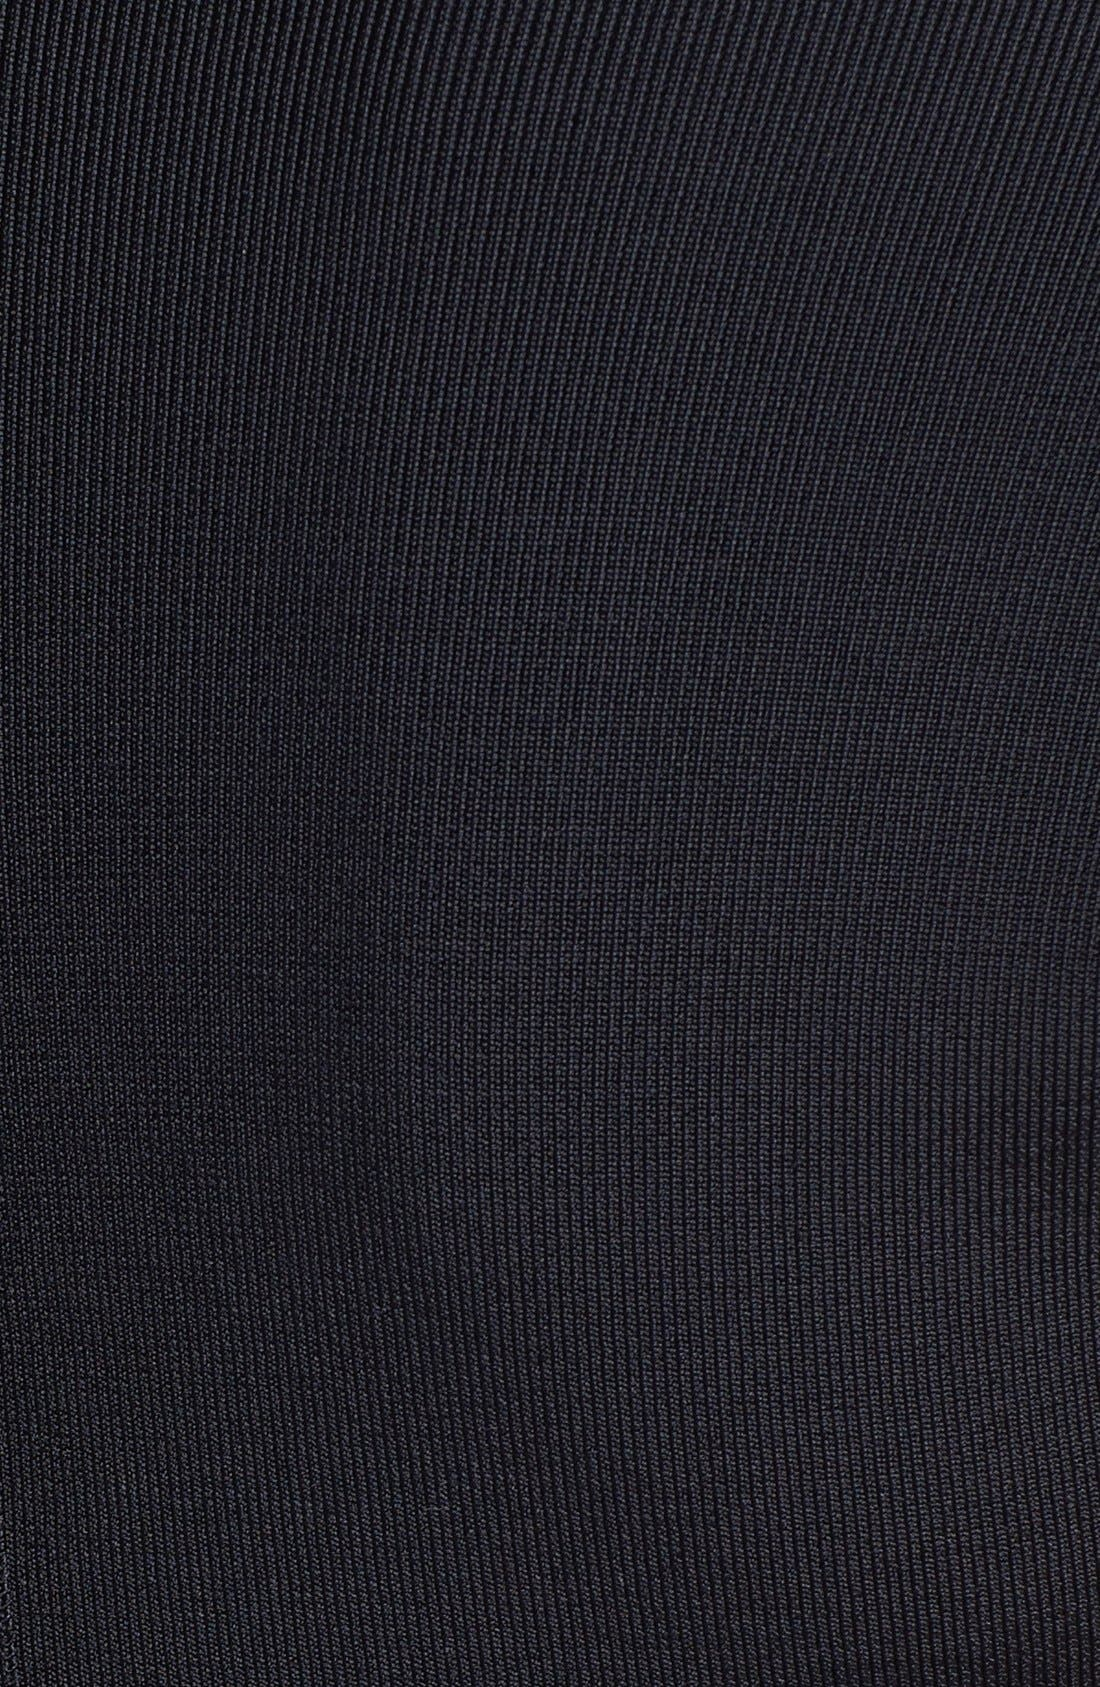 Alternate Image 3  - Vince Camuto Banded Cap Sleeve Knit Dress